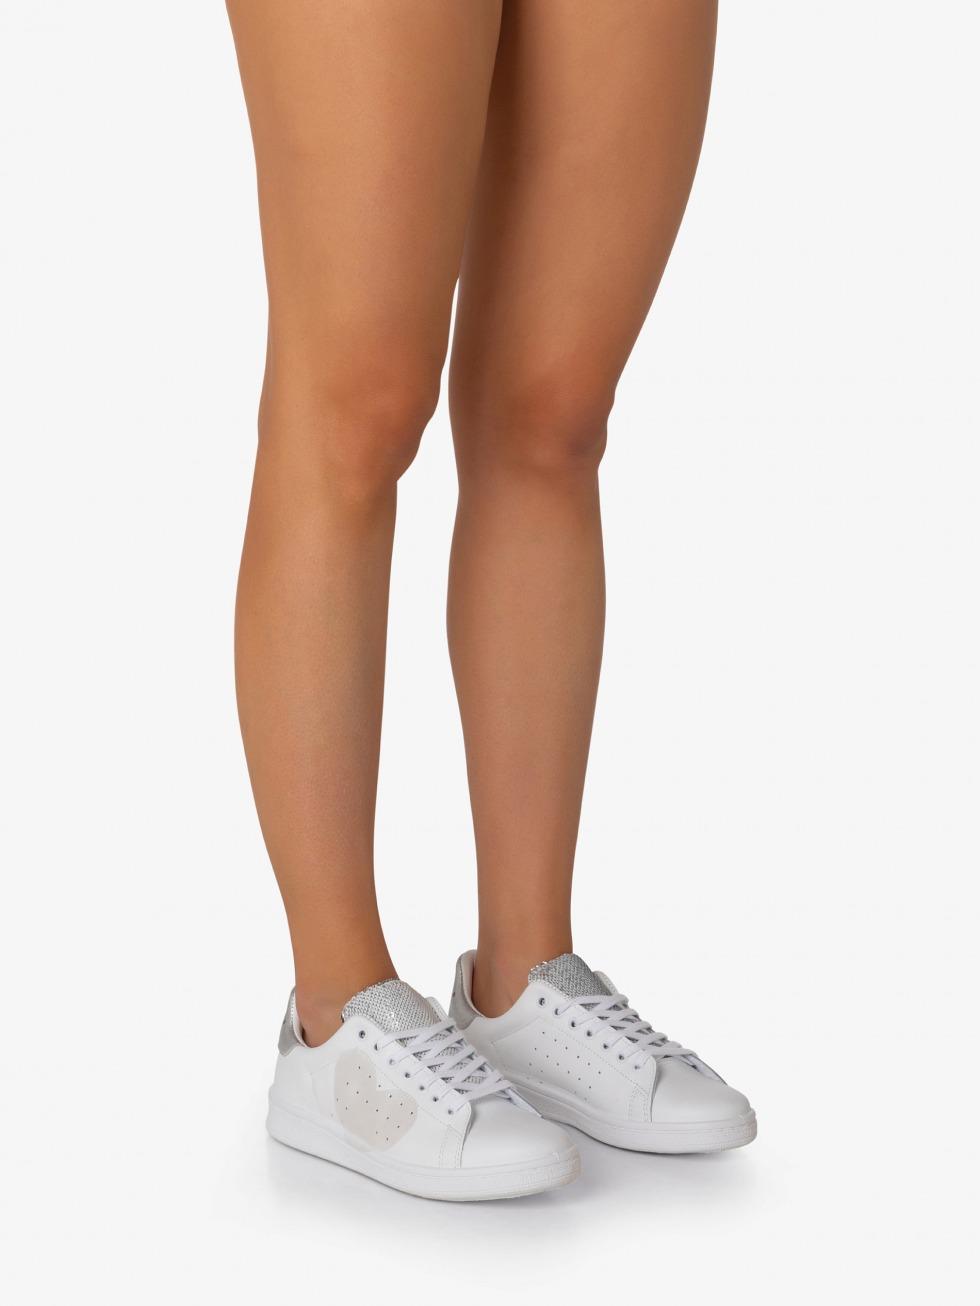 Daiquiri Sneakers - Sparkle Silver Heart